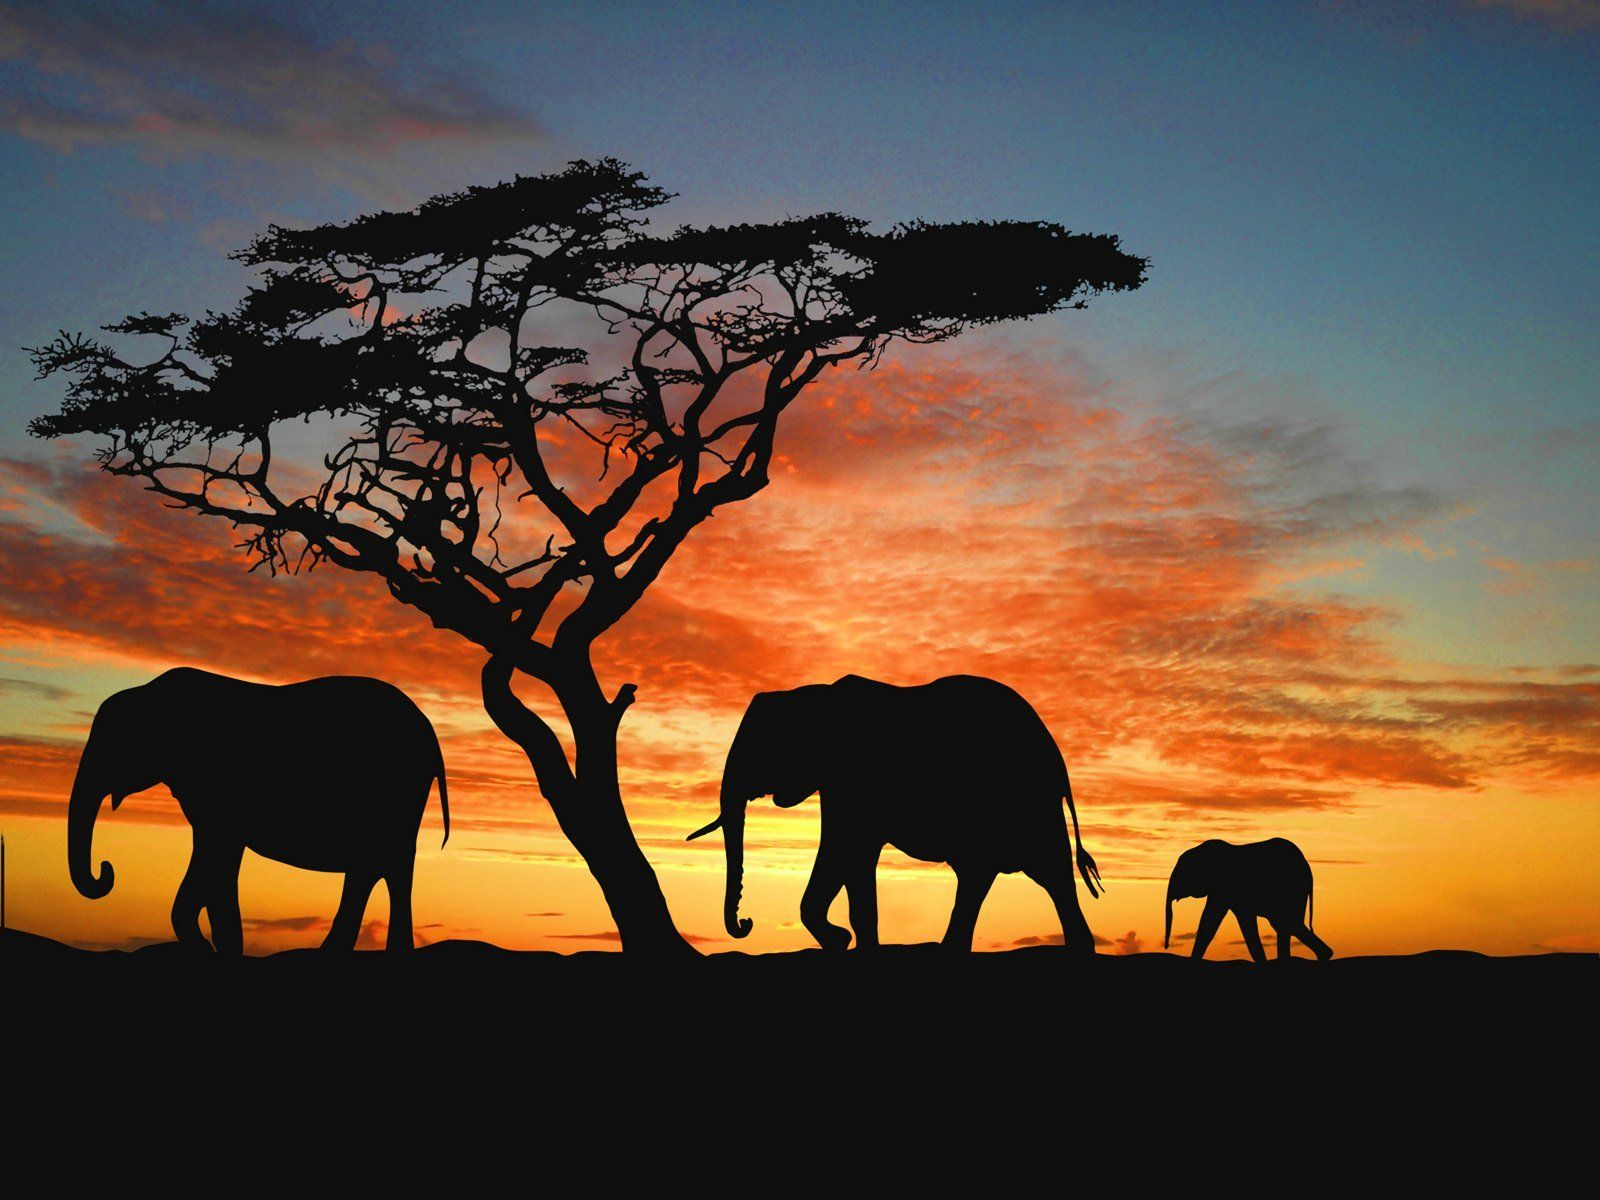 Fondos De Pantalla De Elefantes Wallpapers De Elefantes Paisajes Con Animales Pintura De Elefante Elefantes